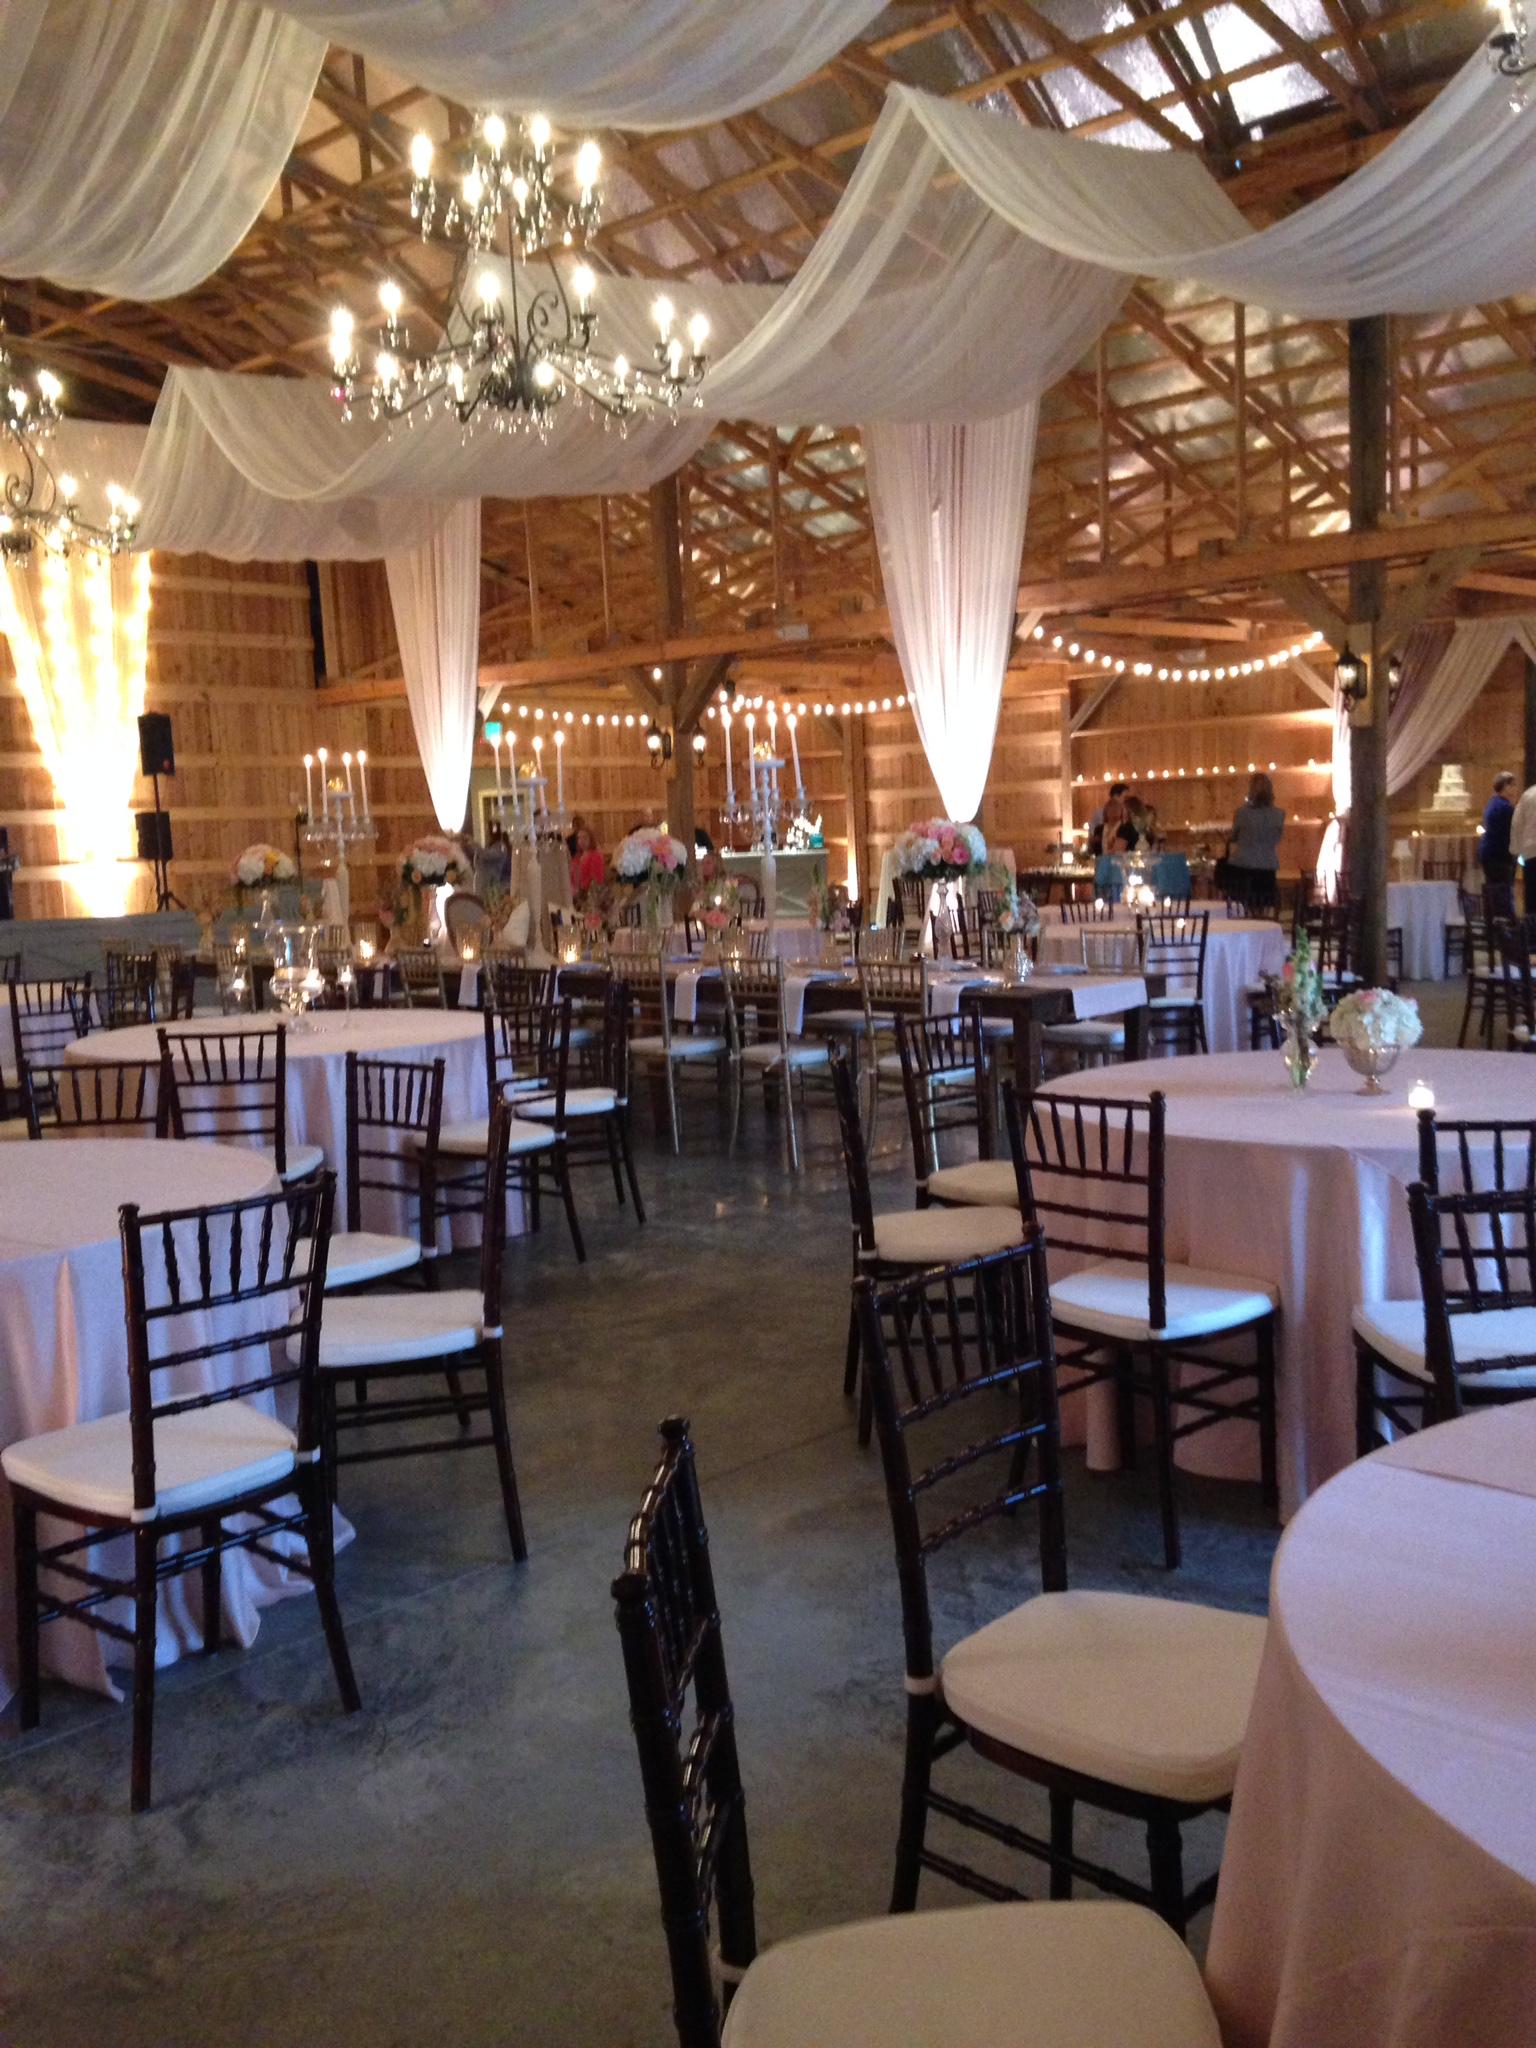 SaddleWoodsFarm-Nashville-Barn-Wedding